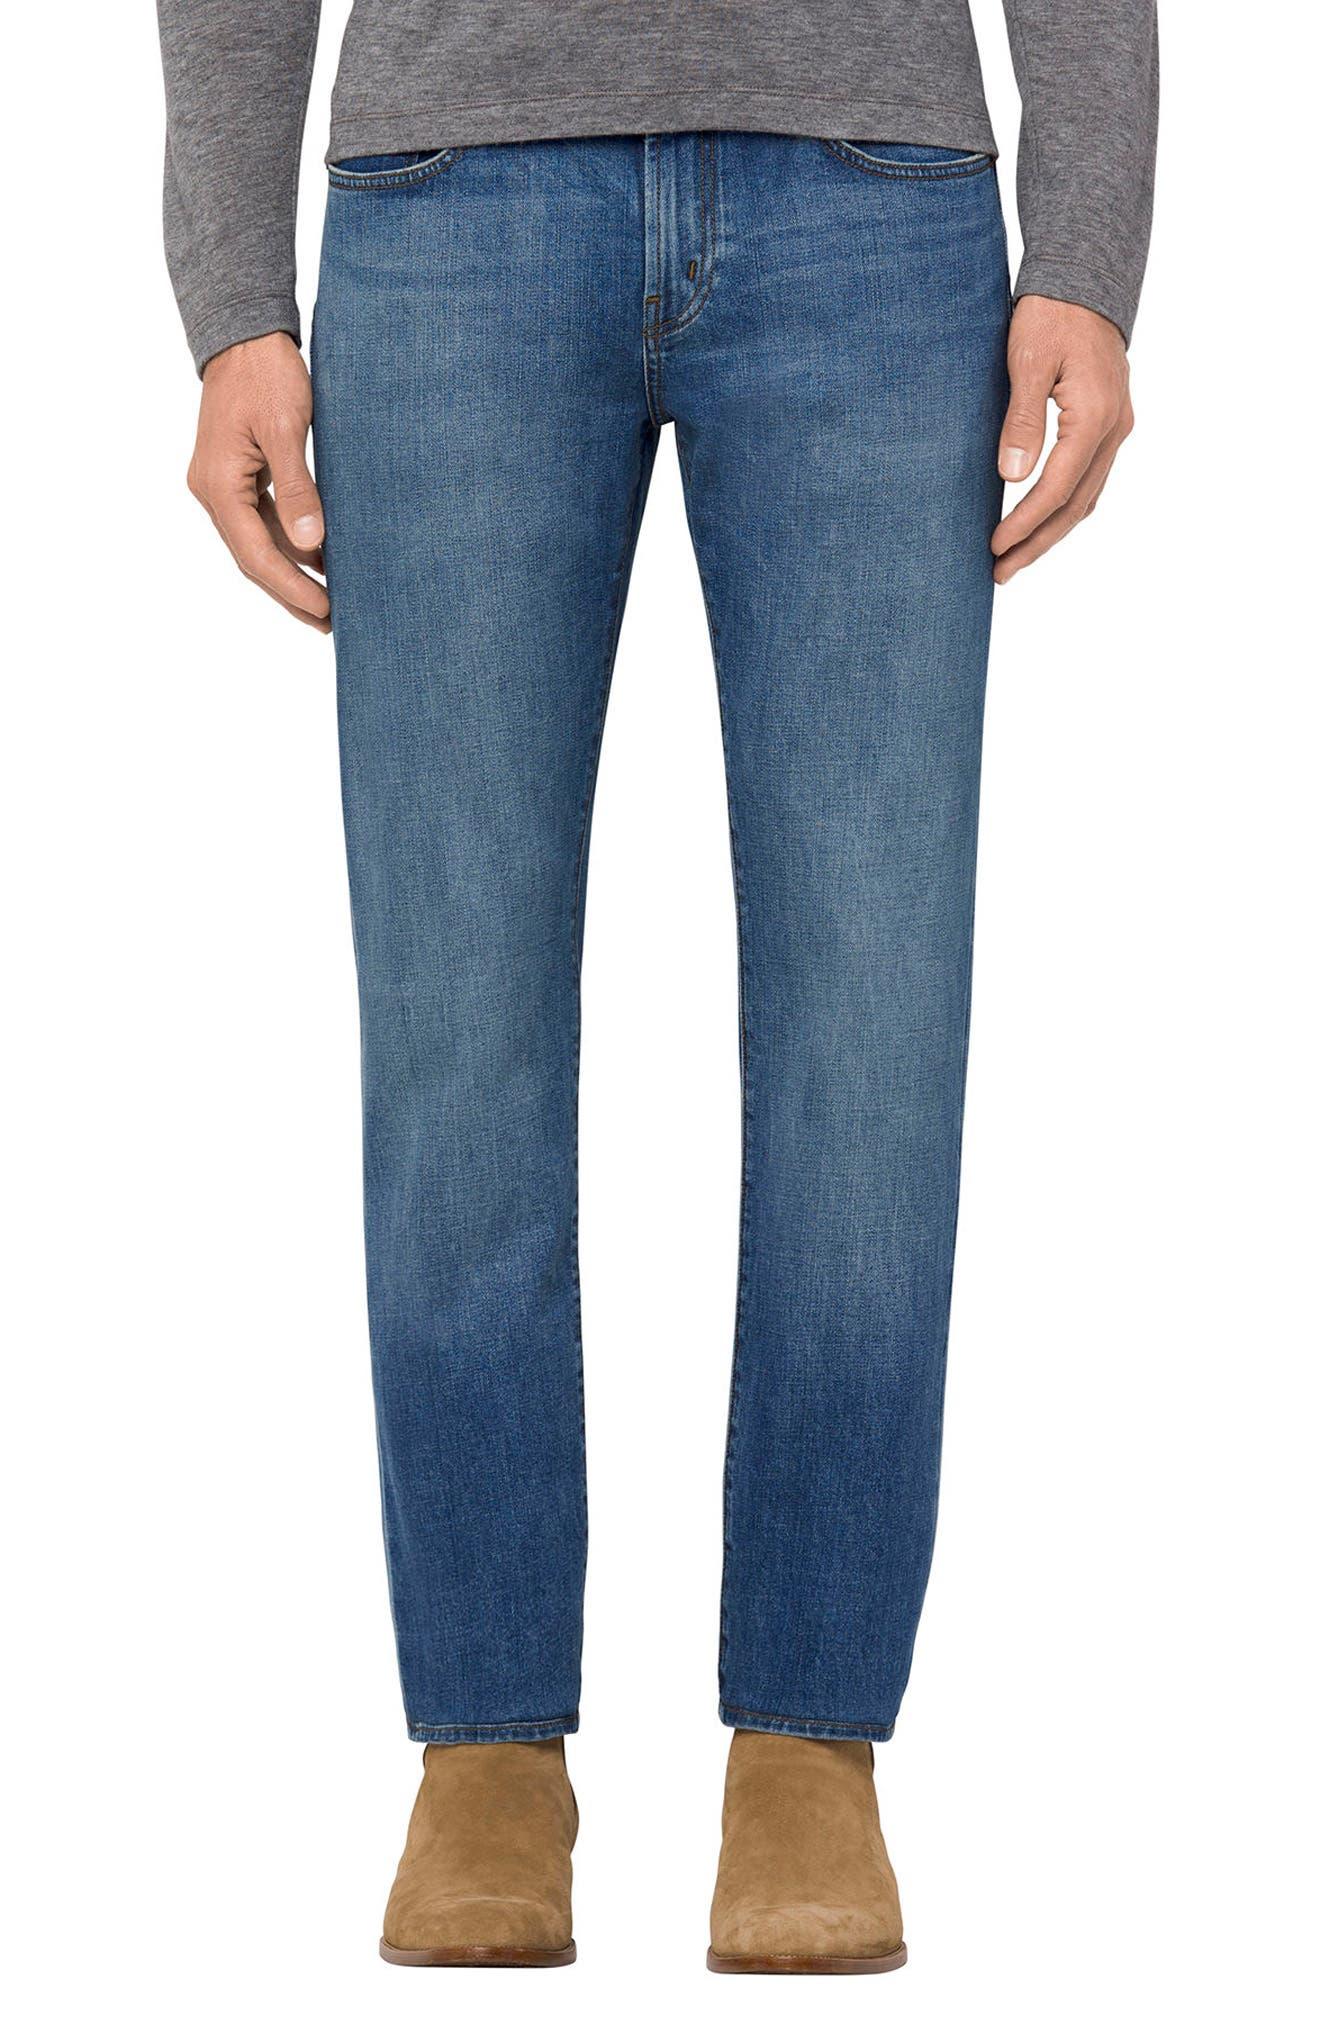 Alternate Image 1 Selected - J Brand Tyler Slim Fit Jeans (Hammerhead)